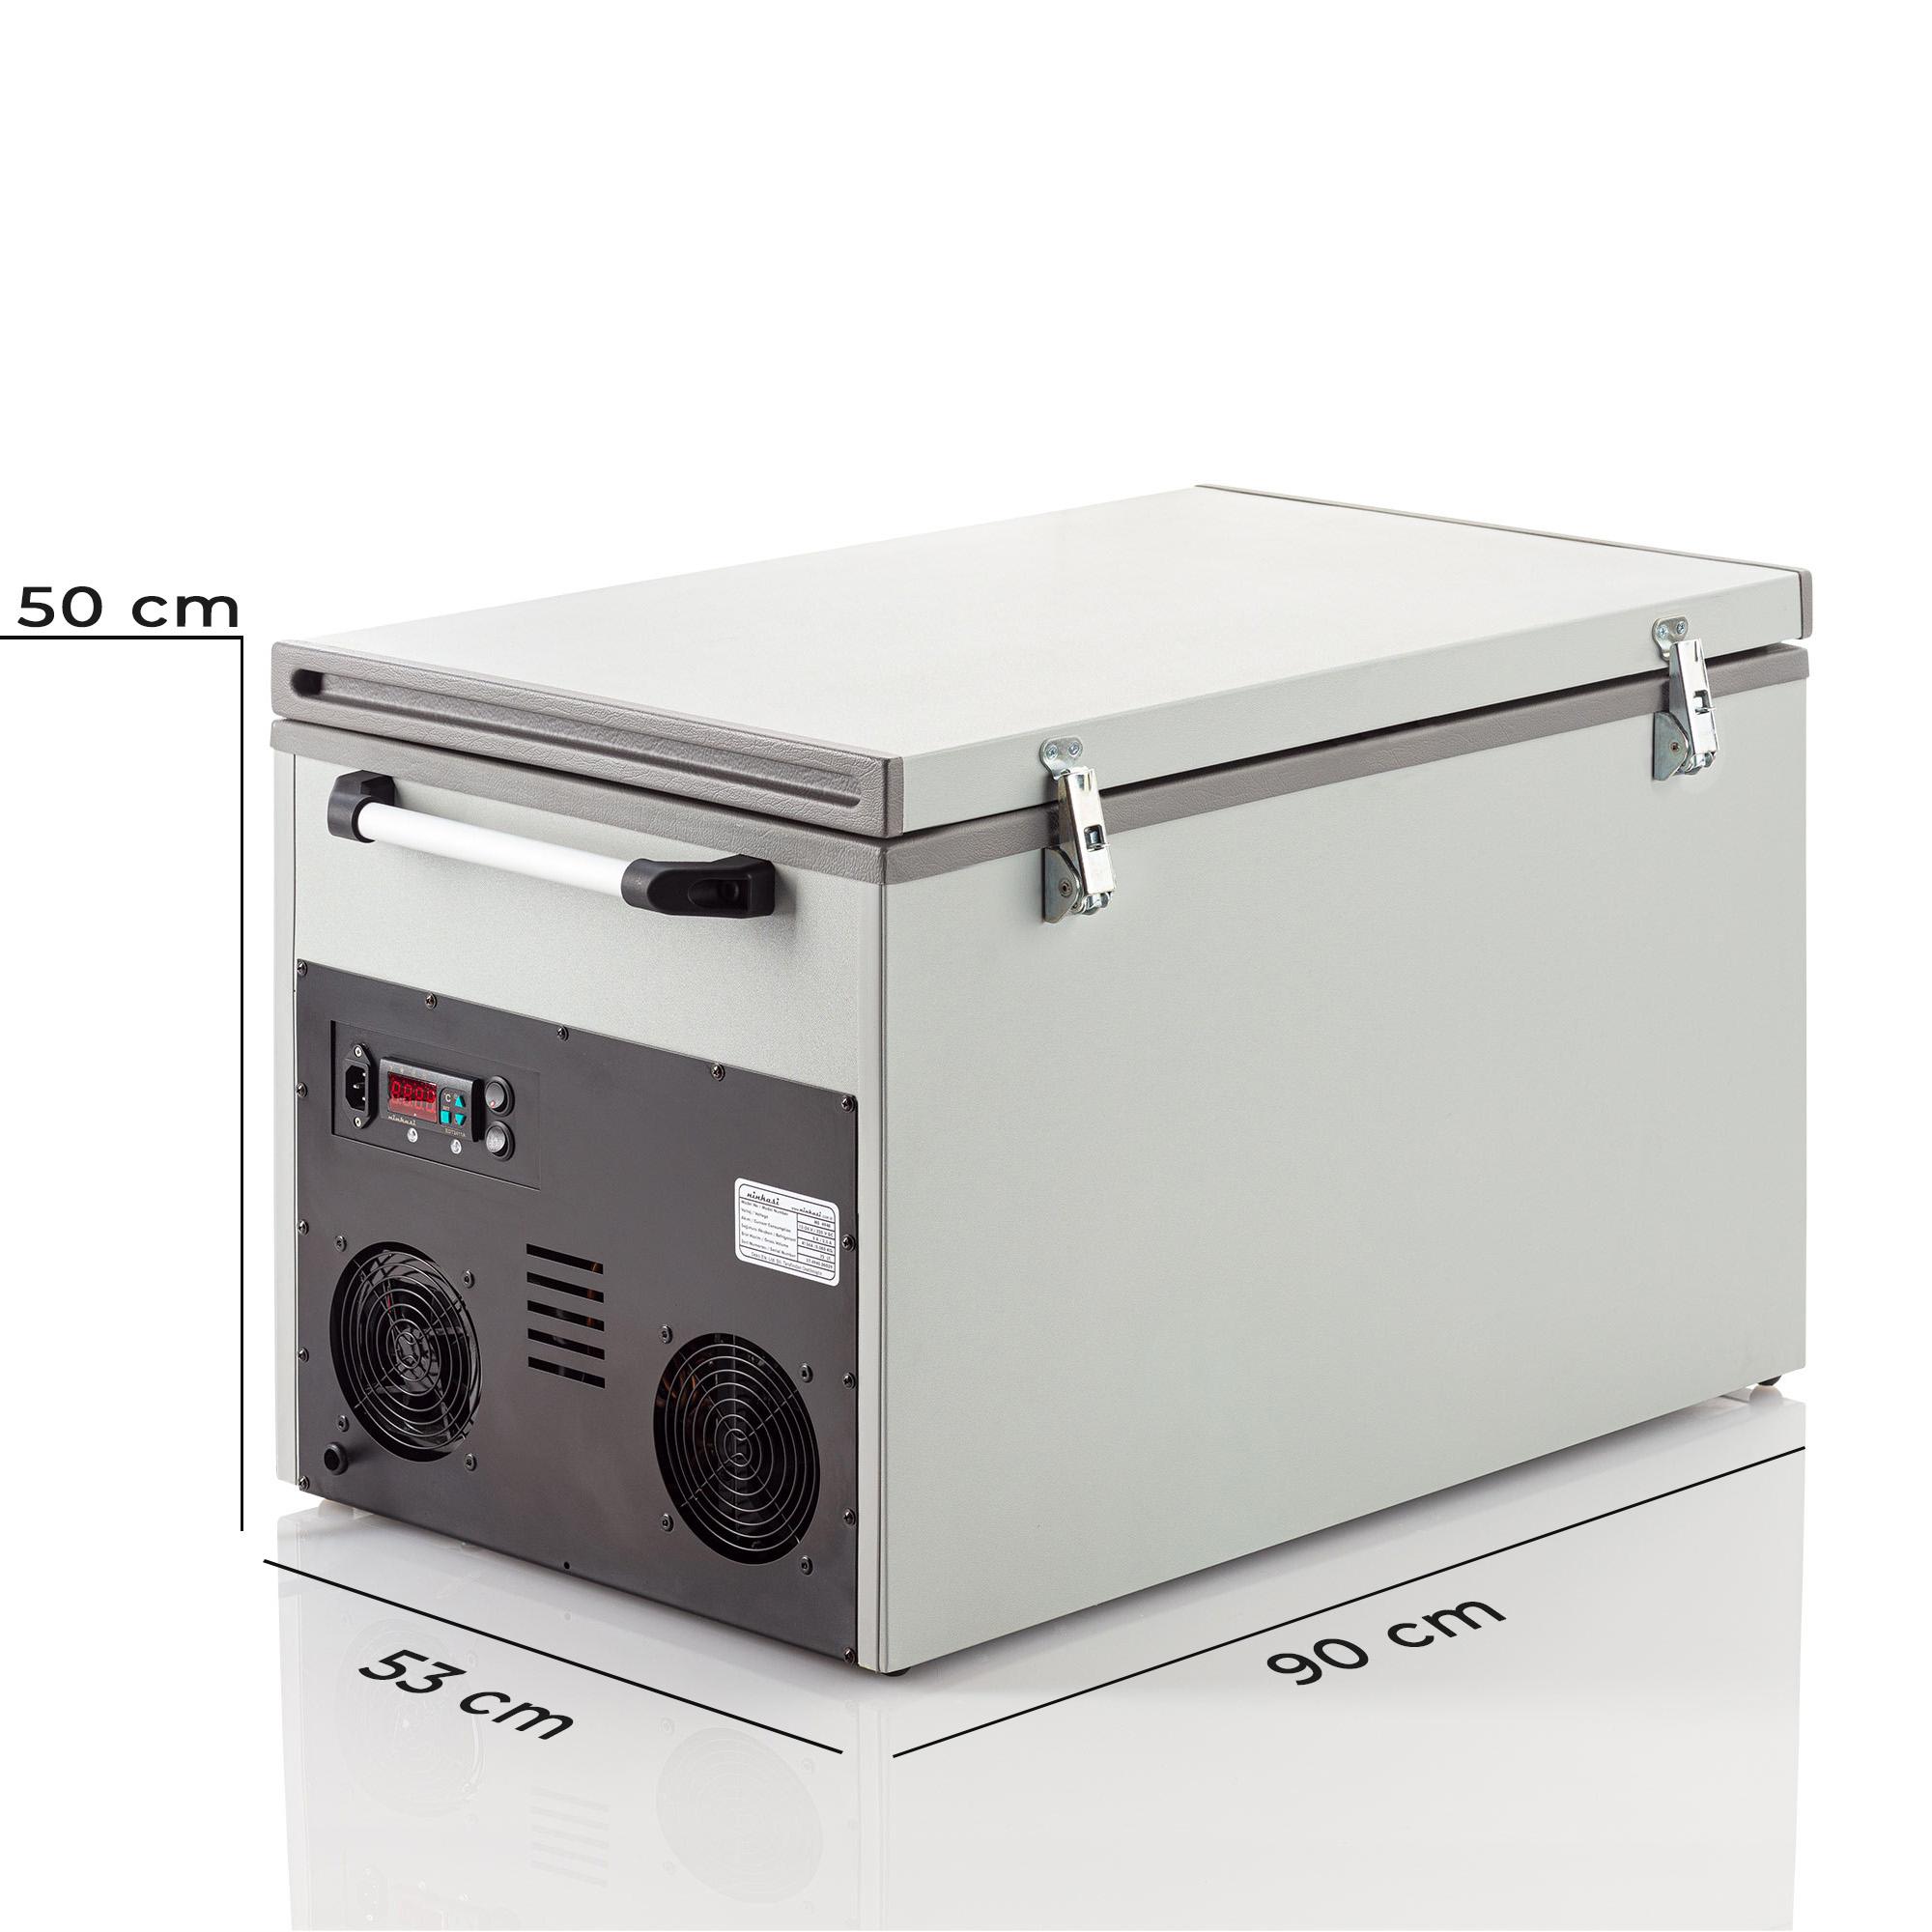 MPO 4950/ 50 LT Soğutucu Araç Buzdolabı